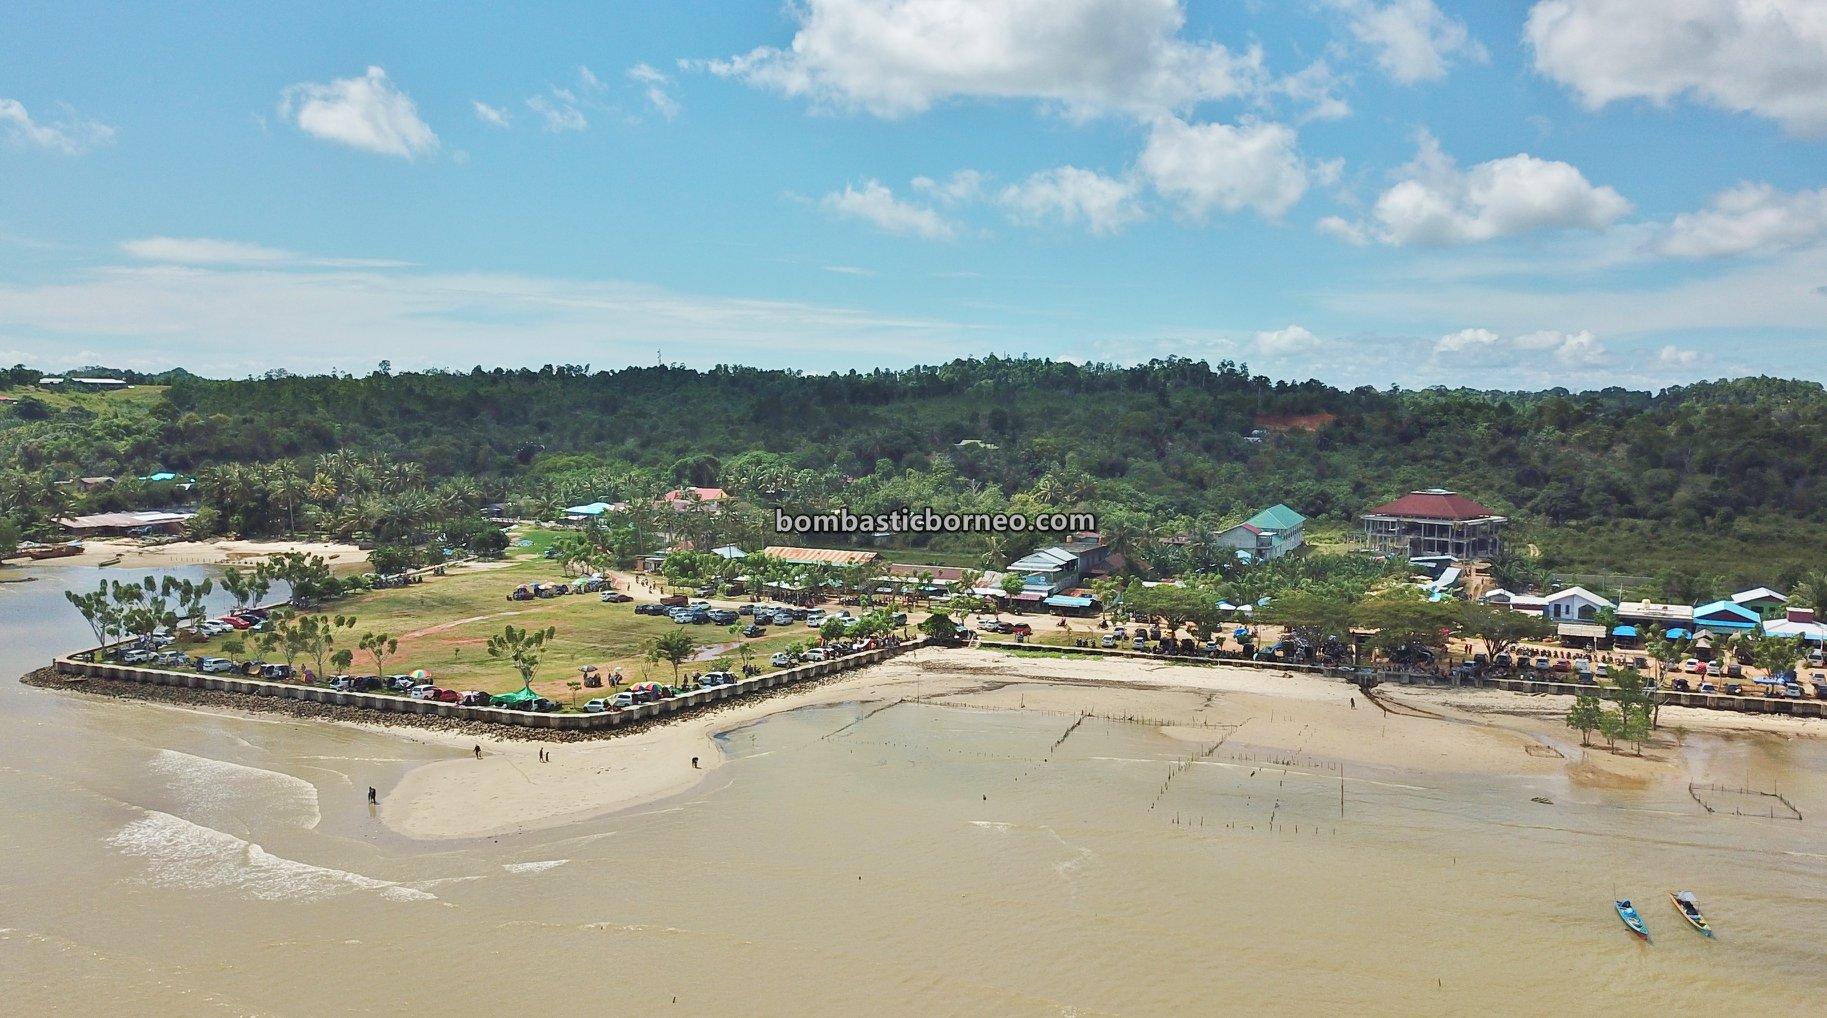 Festival Iraw Tengkayu, Suku Dayak Tidung, backpackers, destination, event, exploration, Amal Beach, Pariwisata, Kaltara, tourist attraction, Trans Border, Borneo, 印尼北加里曼丹, 打拉根旅游景点